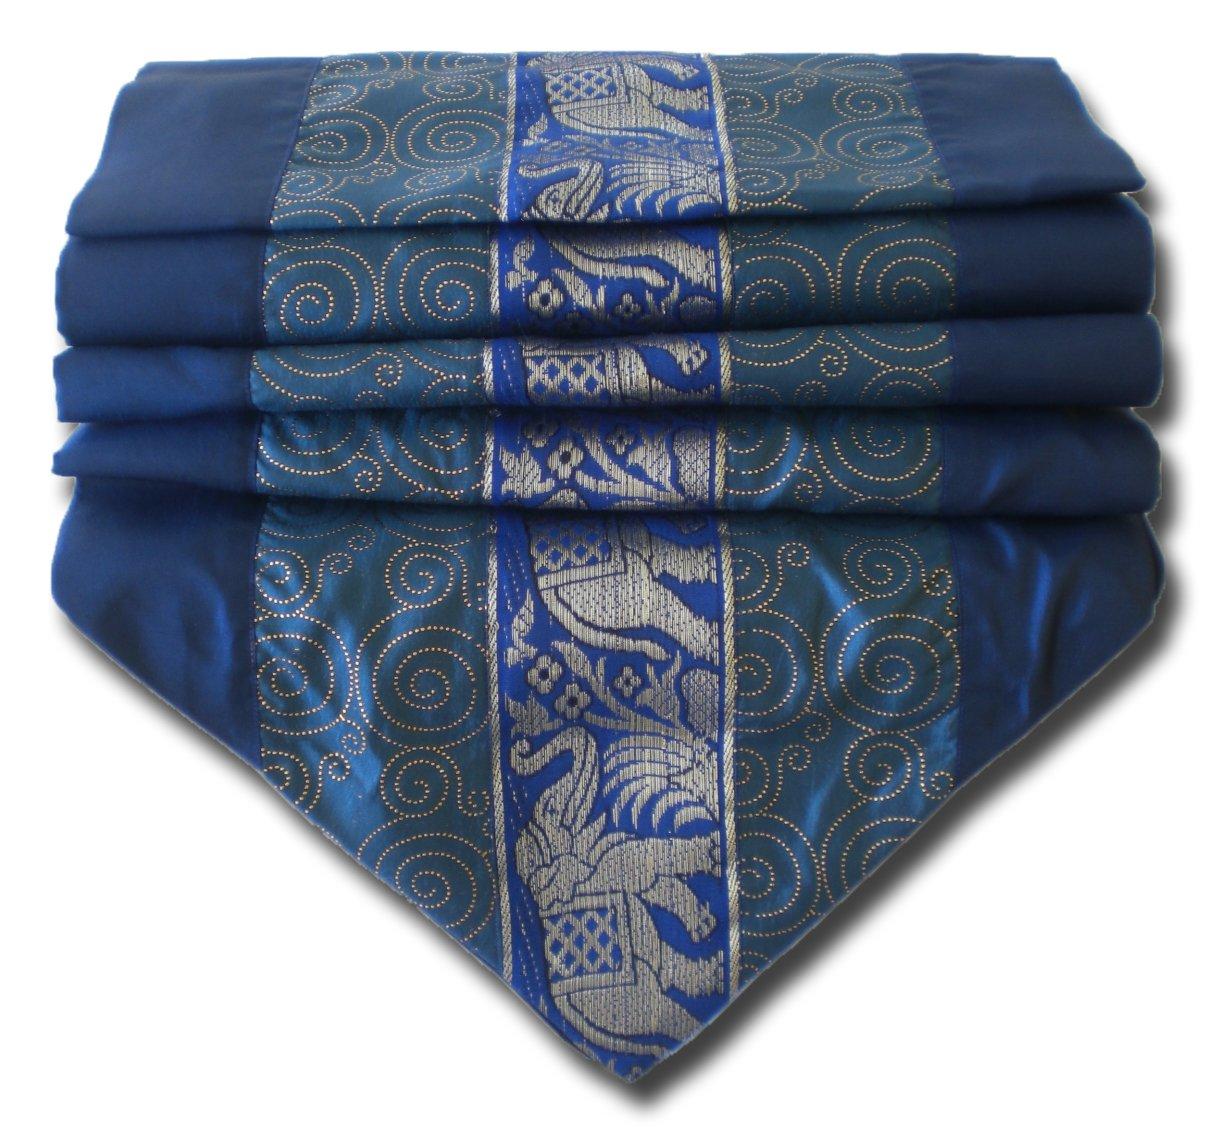 soljo - tablecloth tablerunner table runner linen Thai Silk Elegant precious Elephant 150/200/250 cm x 30 cm many colors (blue, 250 cm x 30 cm)